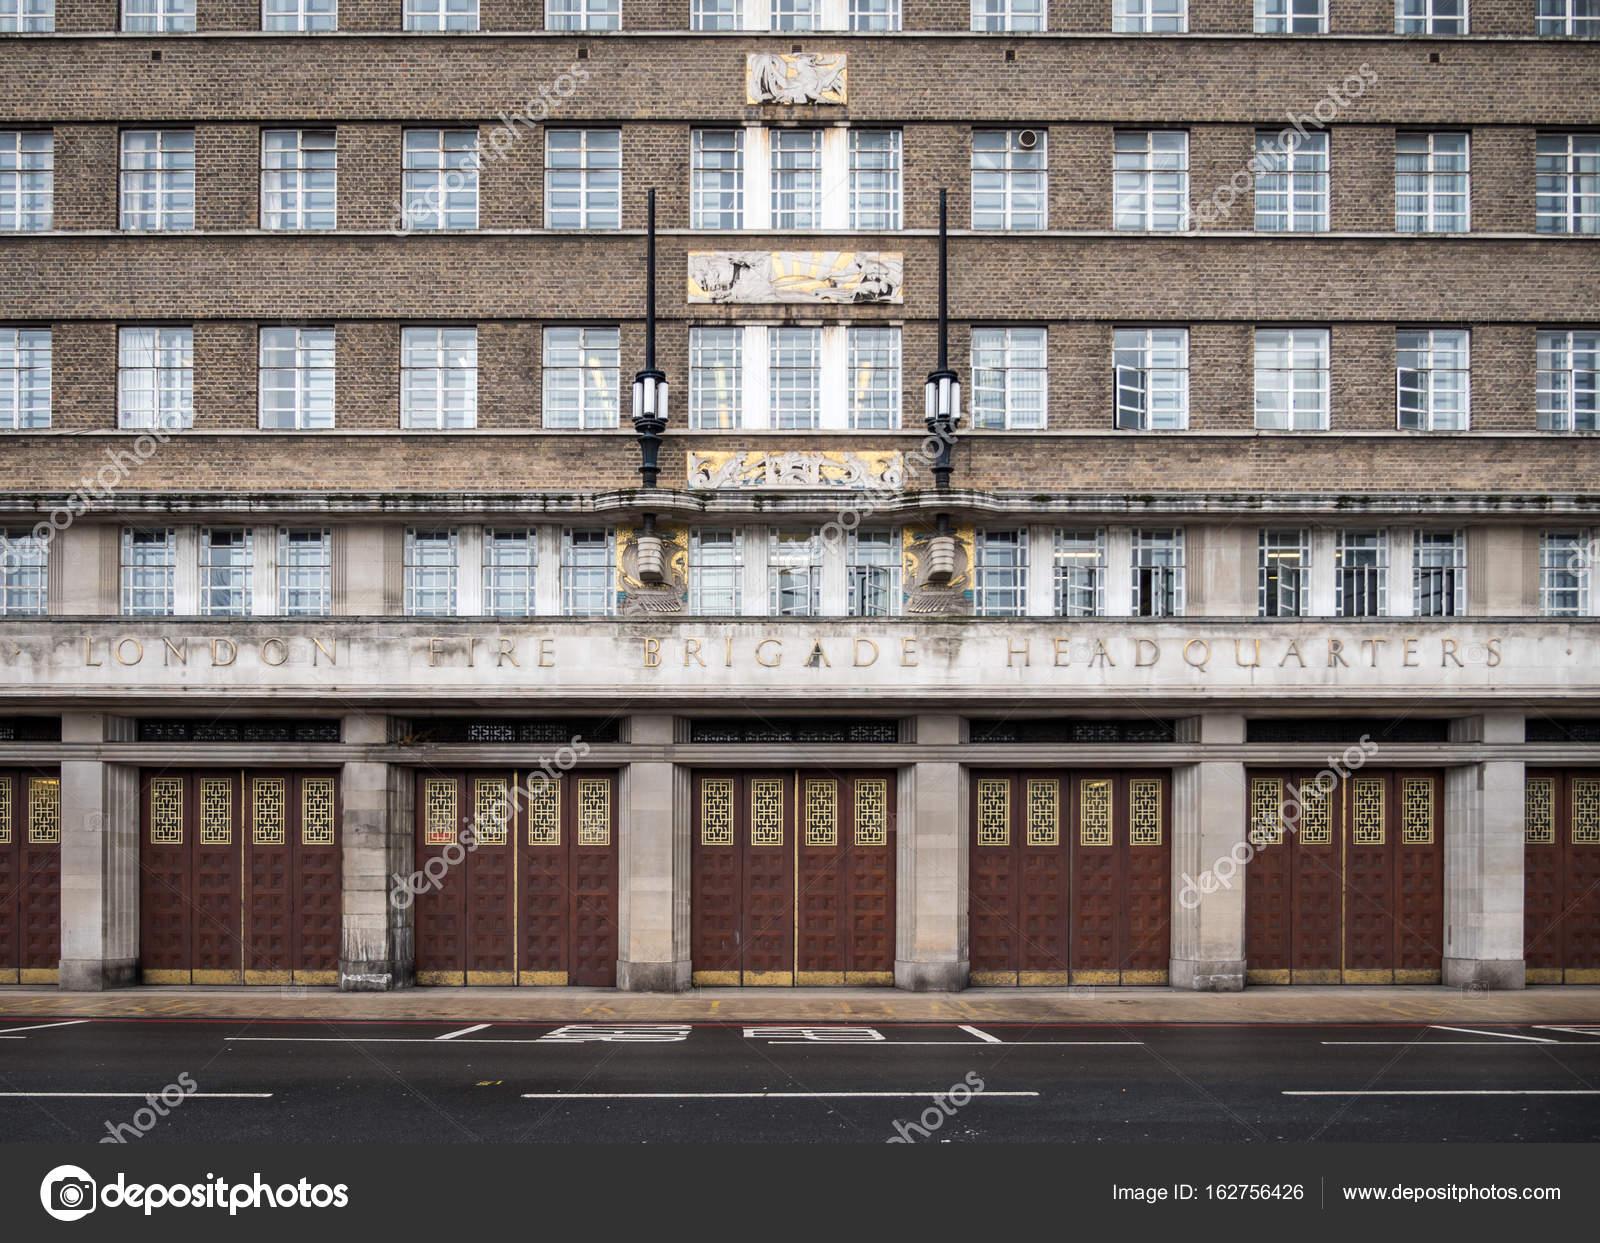 Google Hoofdkwartier Londen : London fire brigade hoofdkwartier u2014 stockfoto © pxl.store #162756426